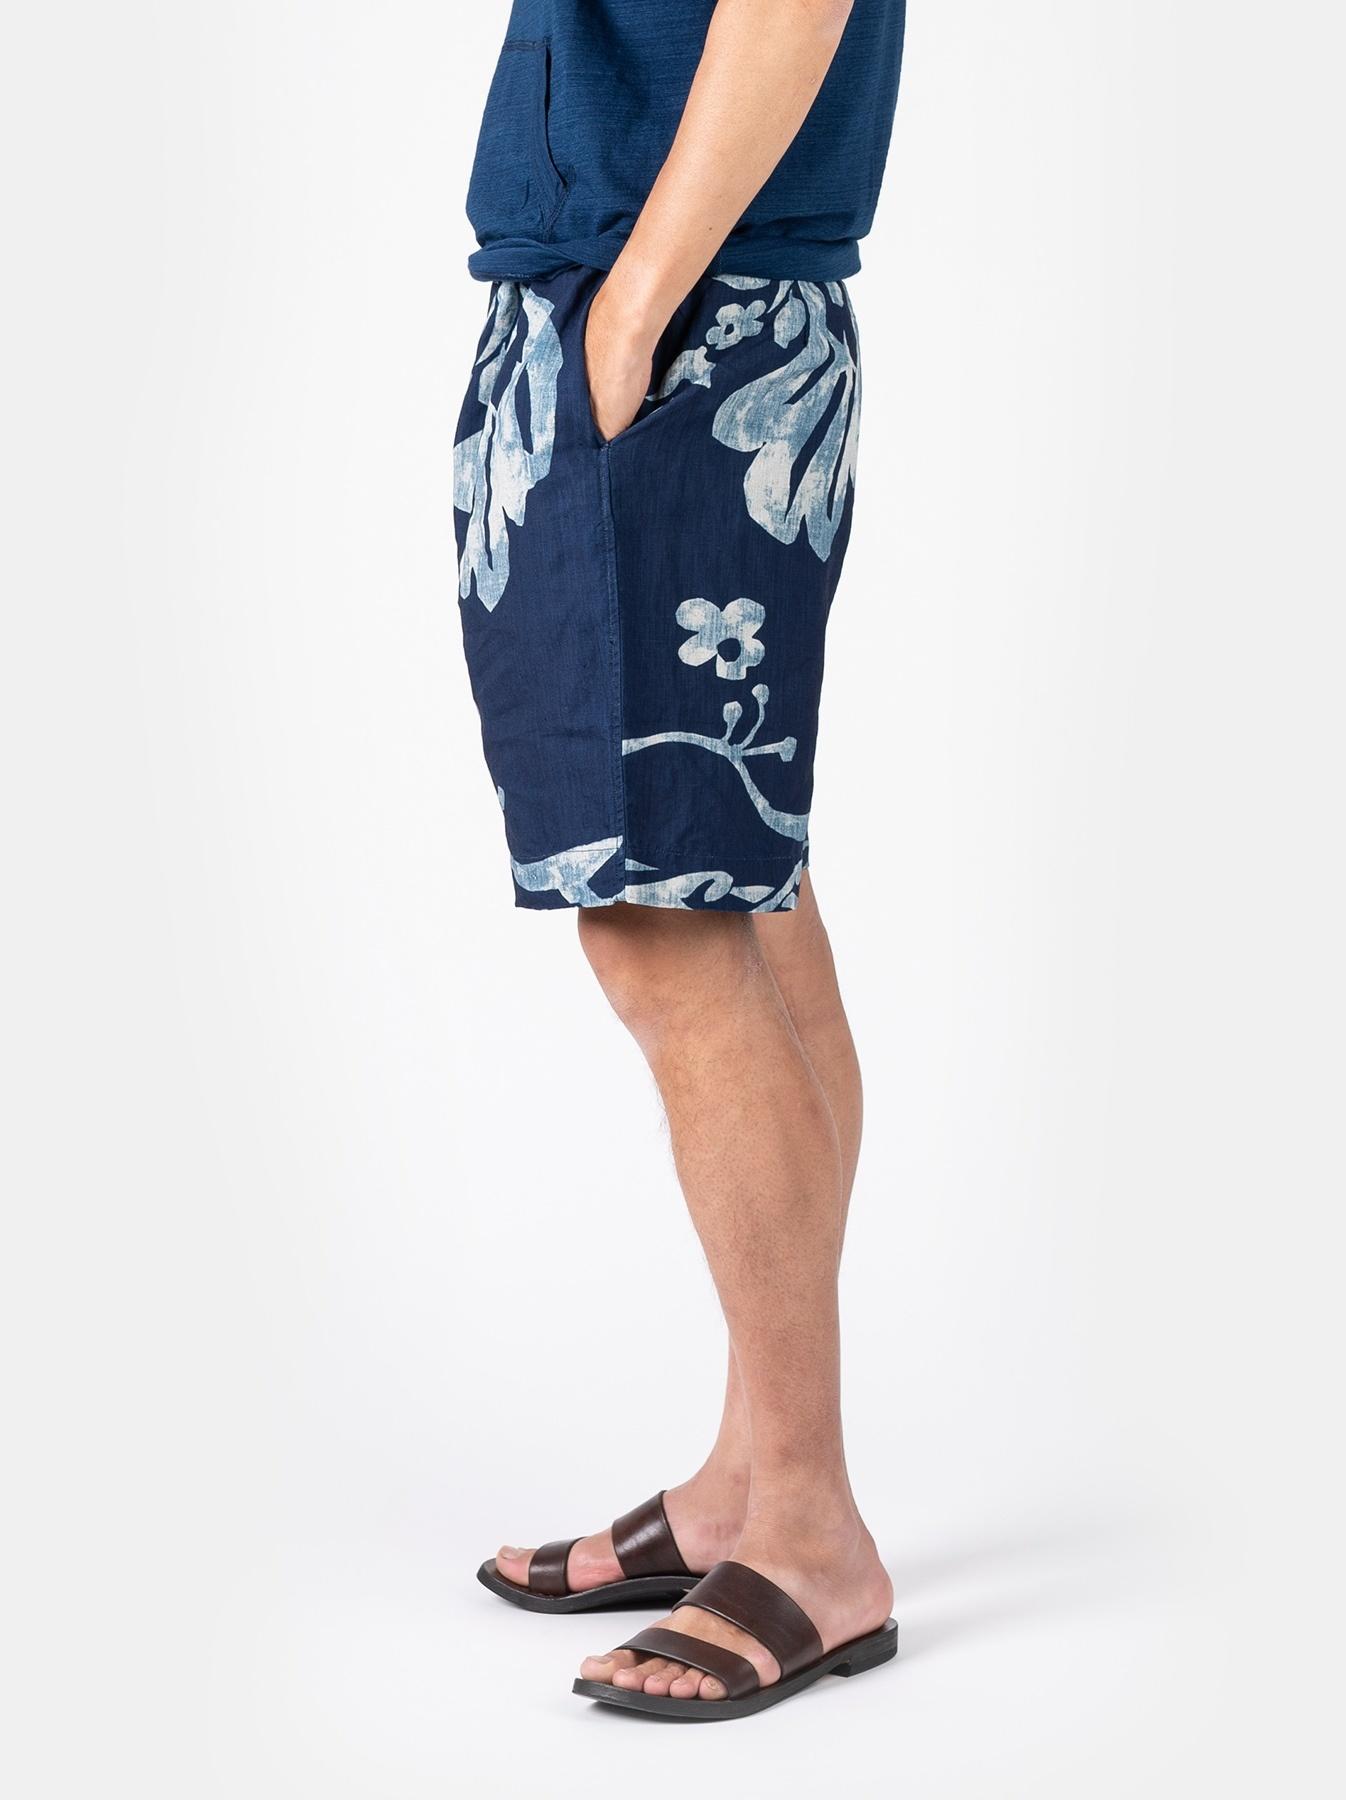 WH Indigo Linen Umiiloha 908 Short Pants-4